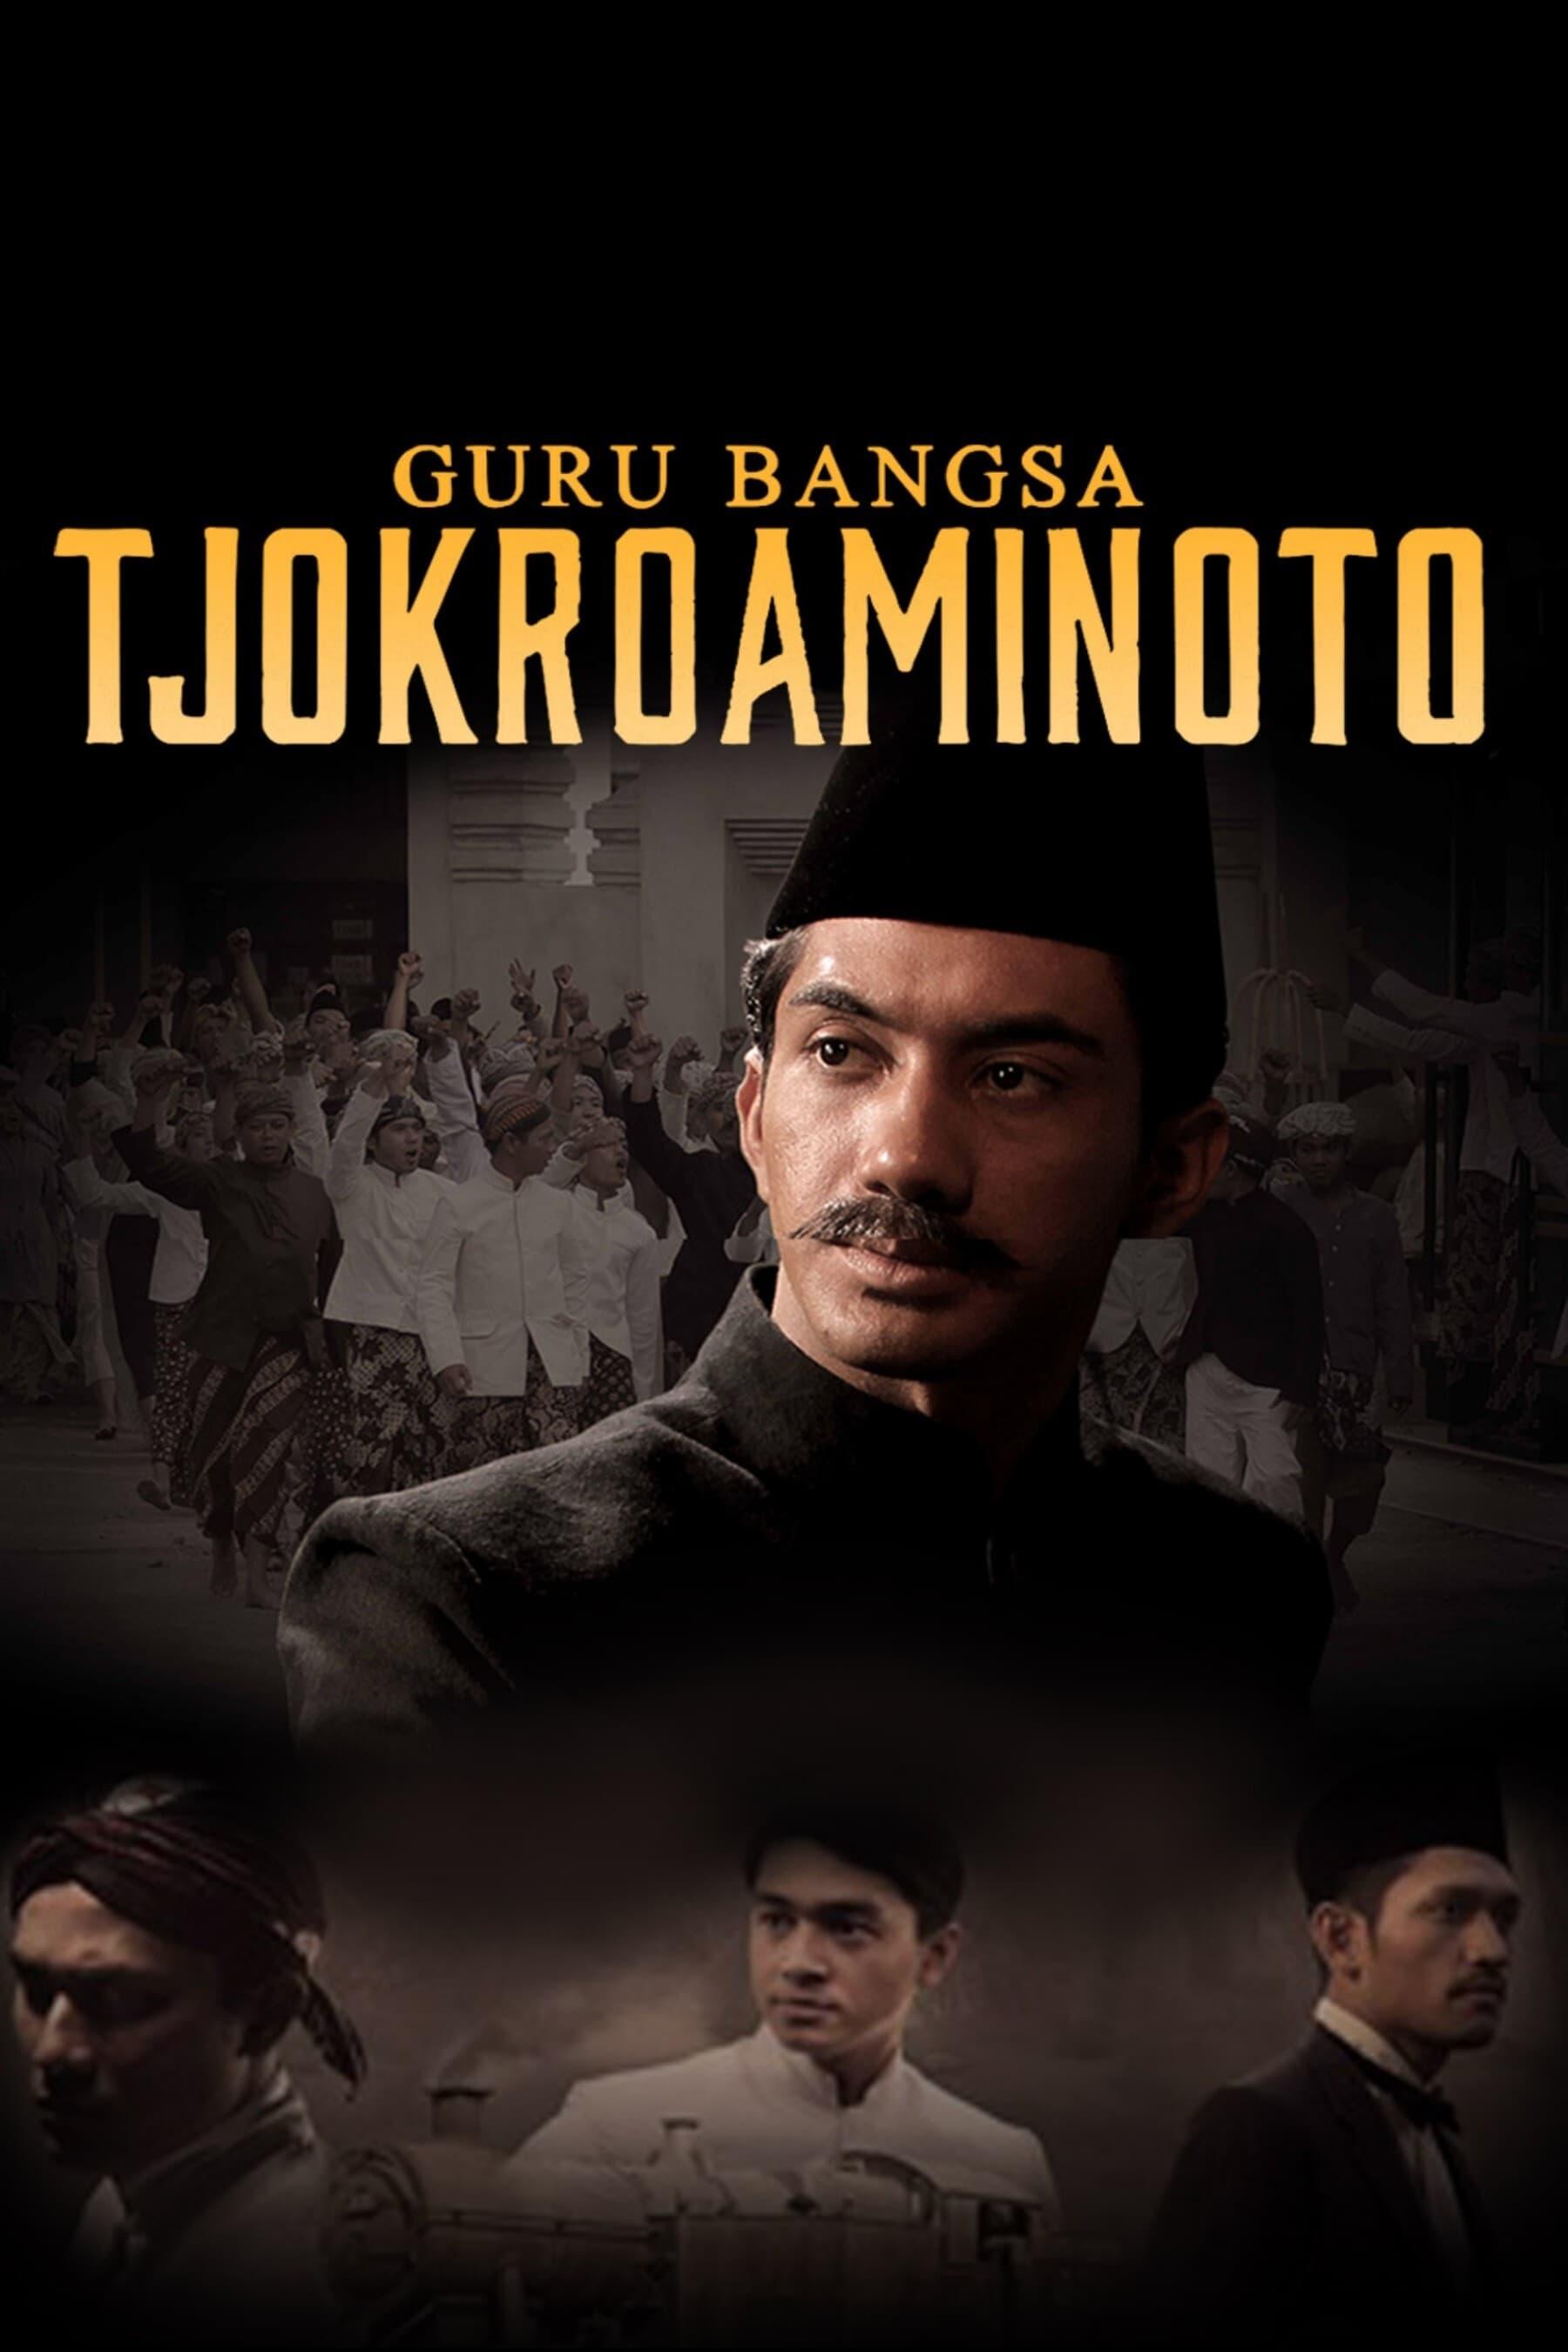 Guru Bangsa Tjokroaminoto